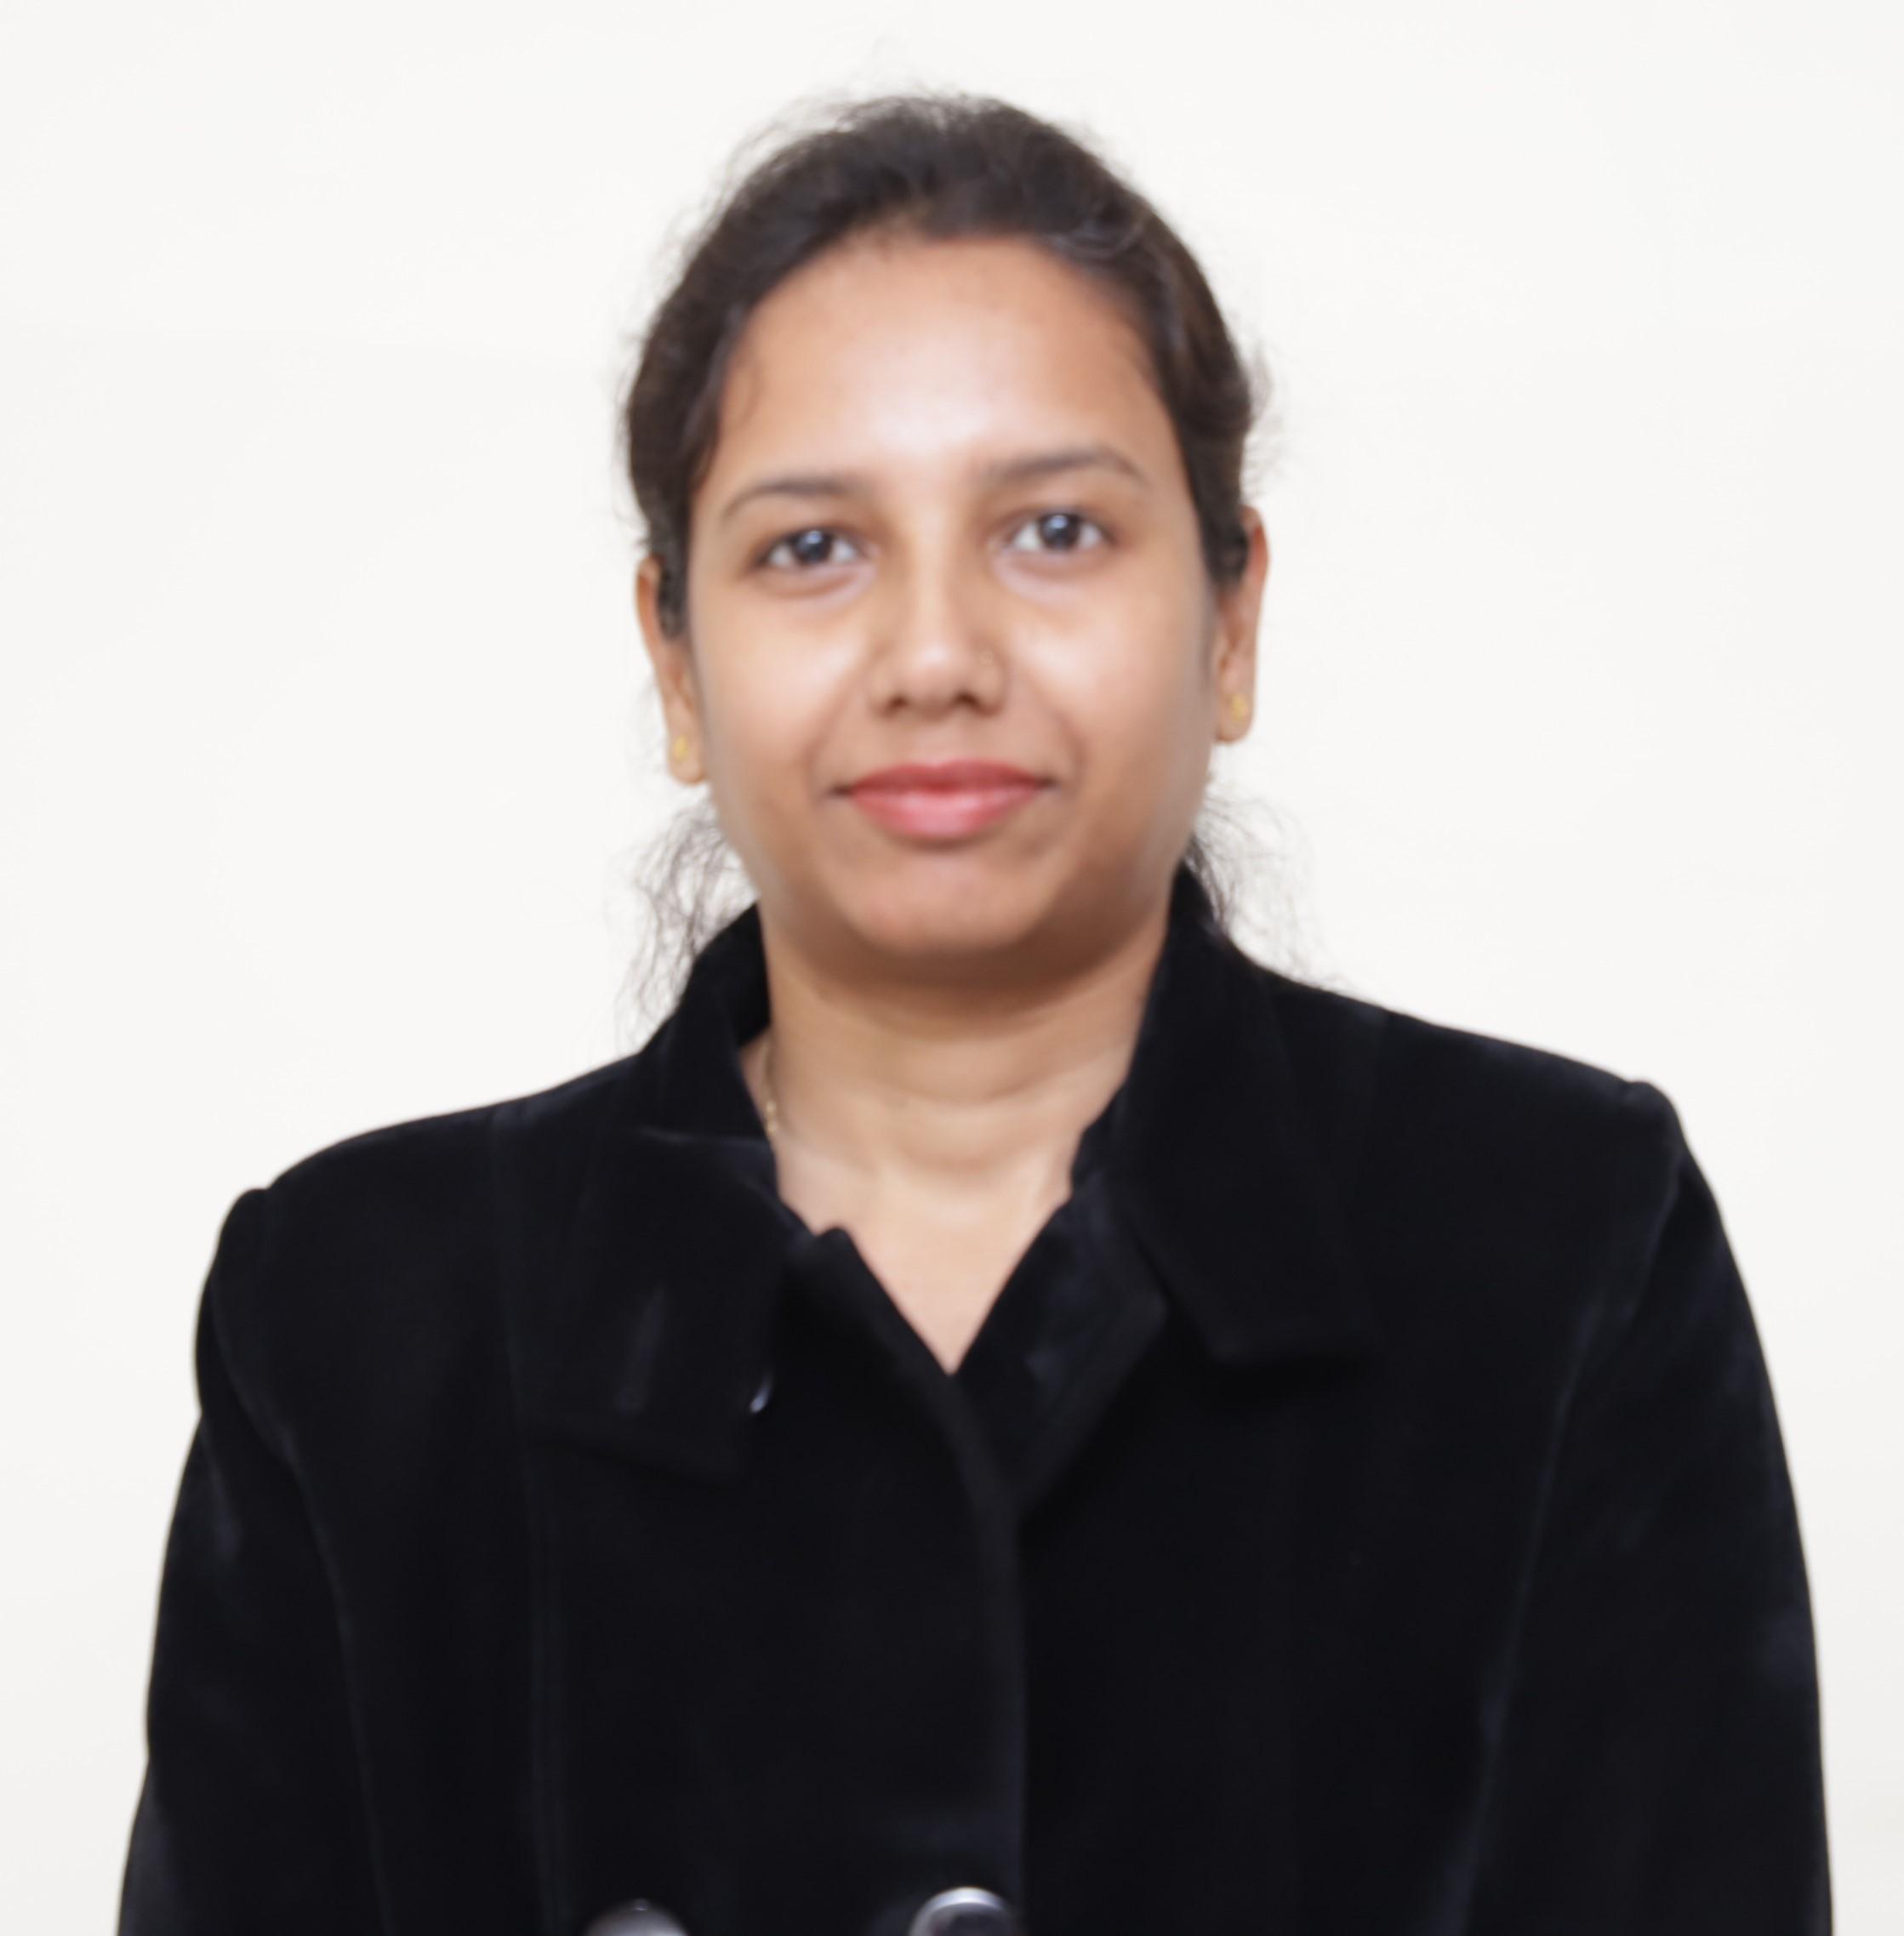 Ms. Ankita Kishore